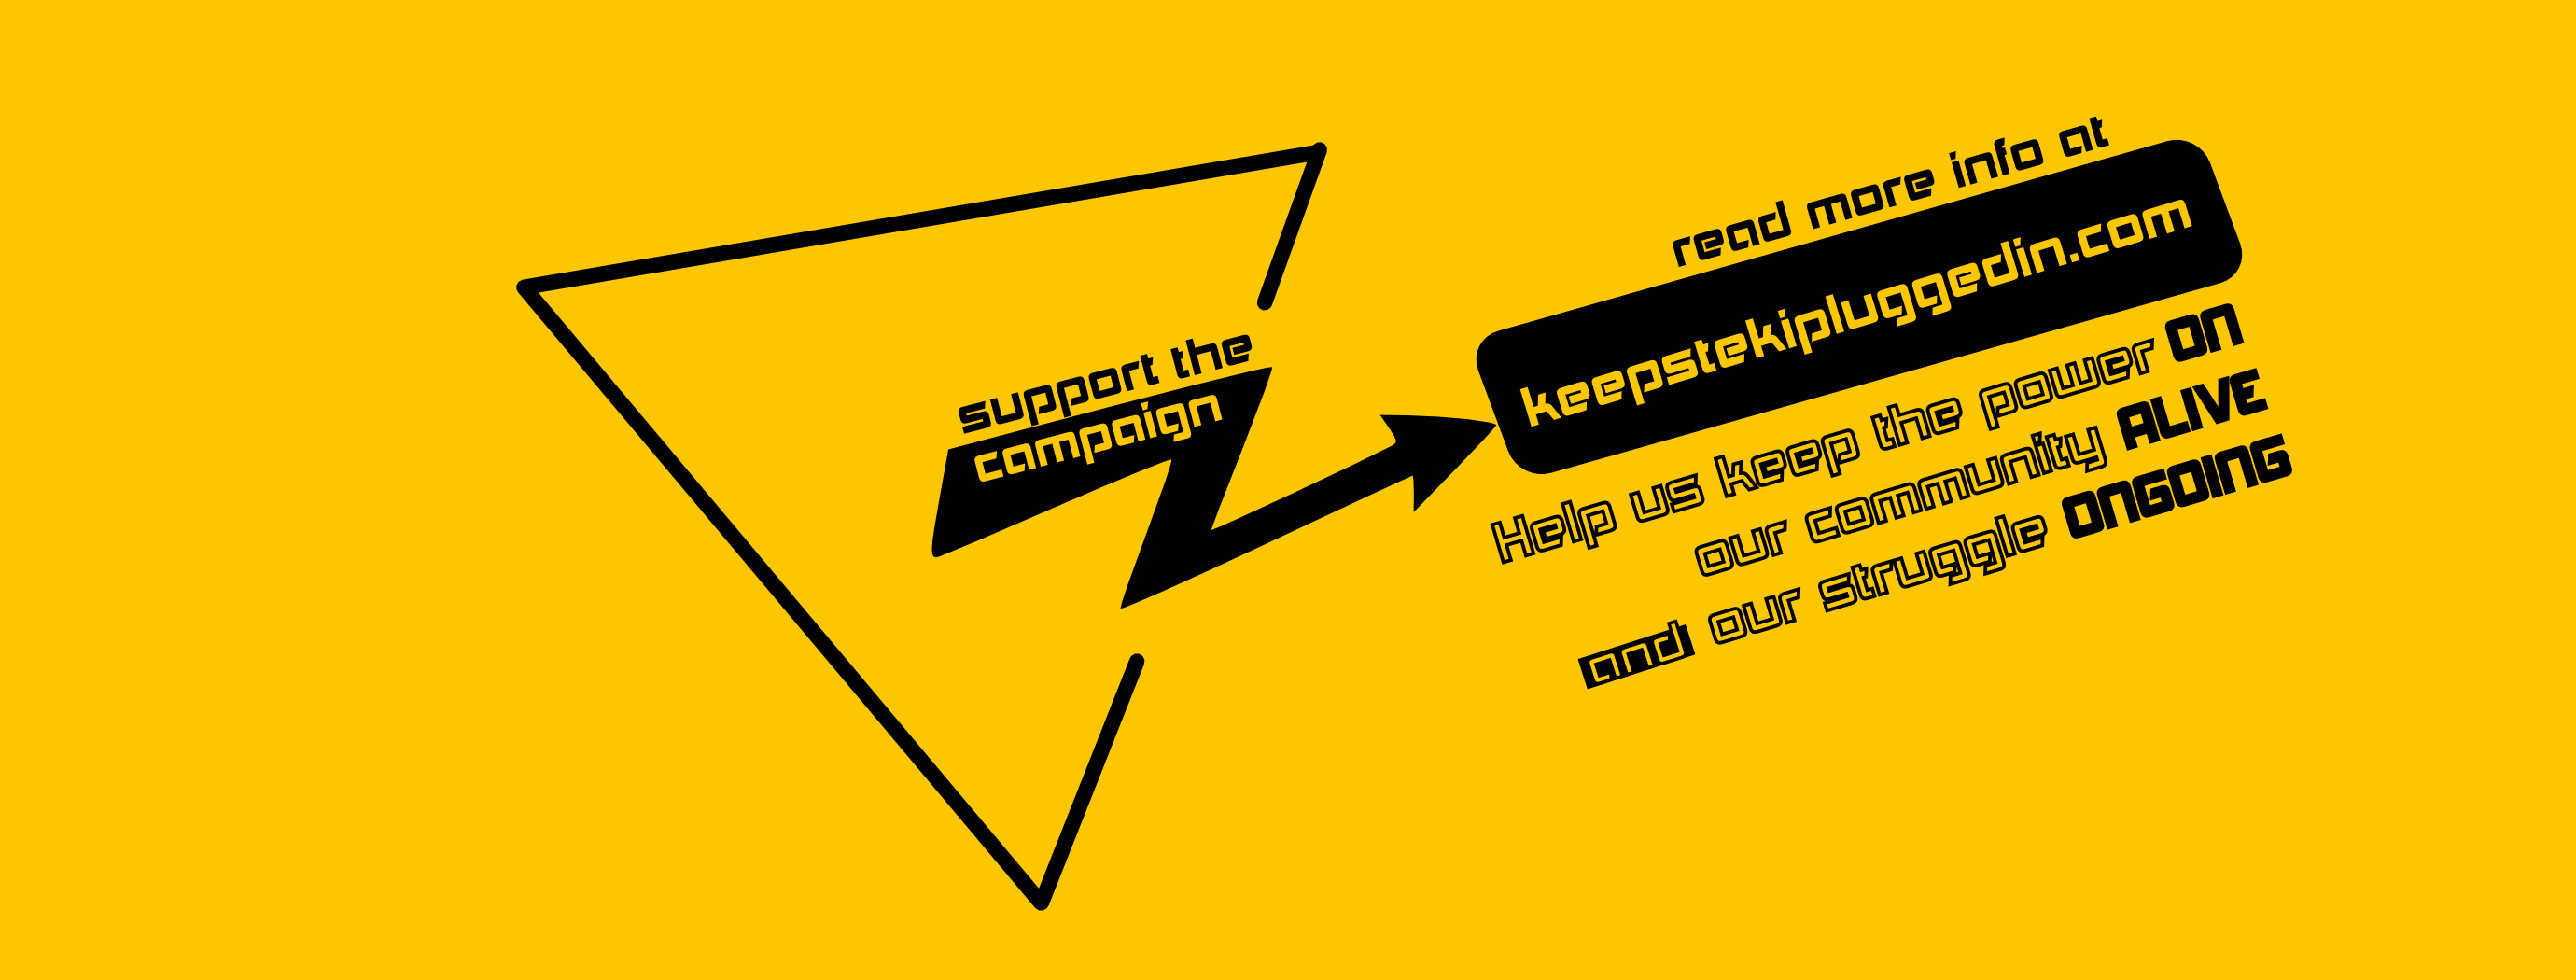 Keep Steki Plugged In! || Βοηθήστε το Στέκι να παραμείνει ανοιχτό!